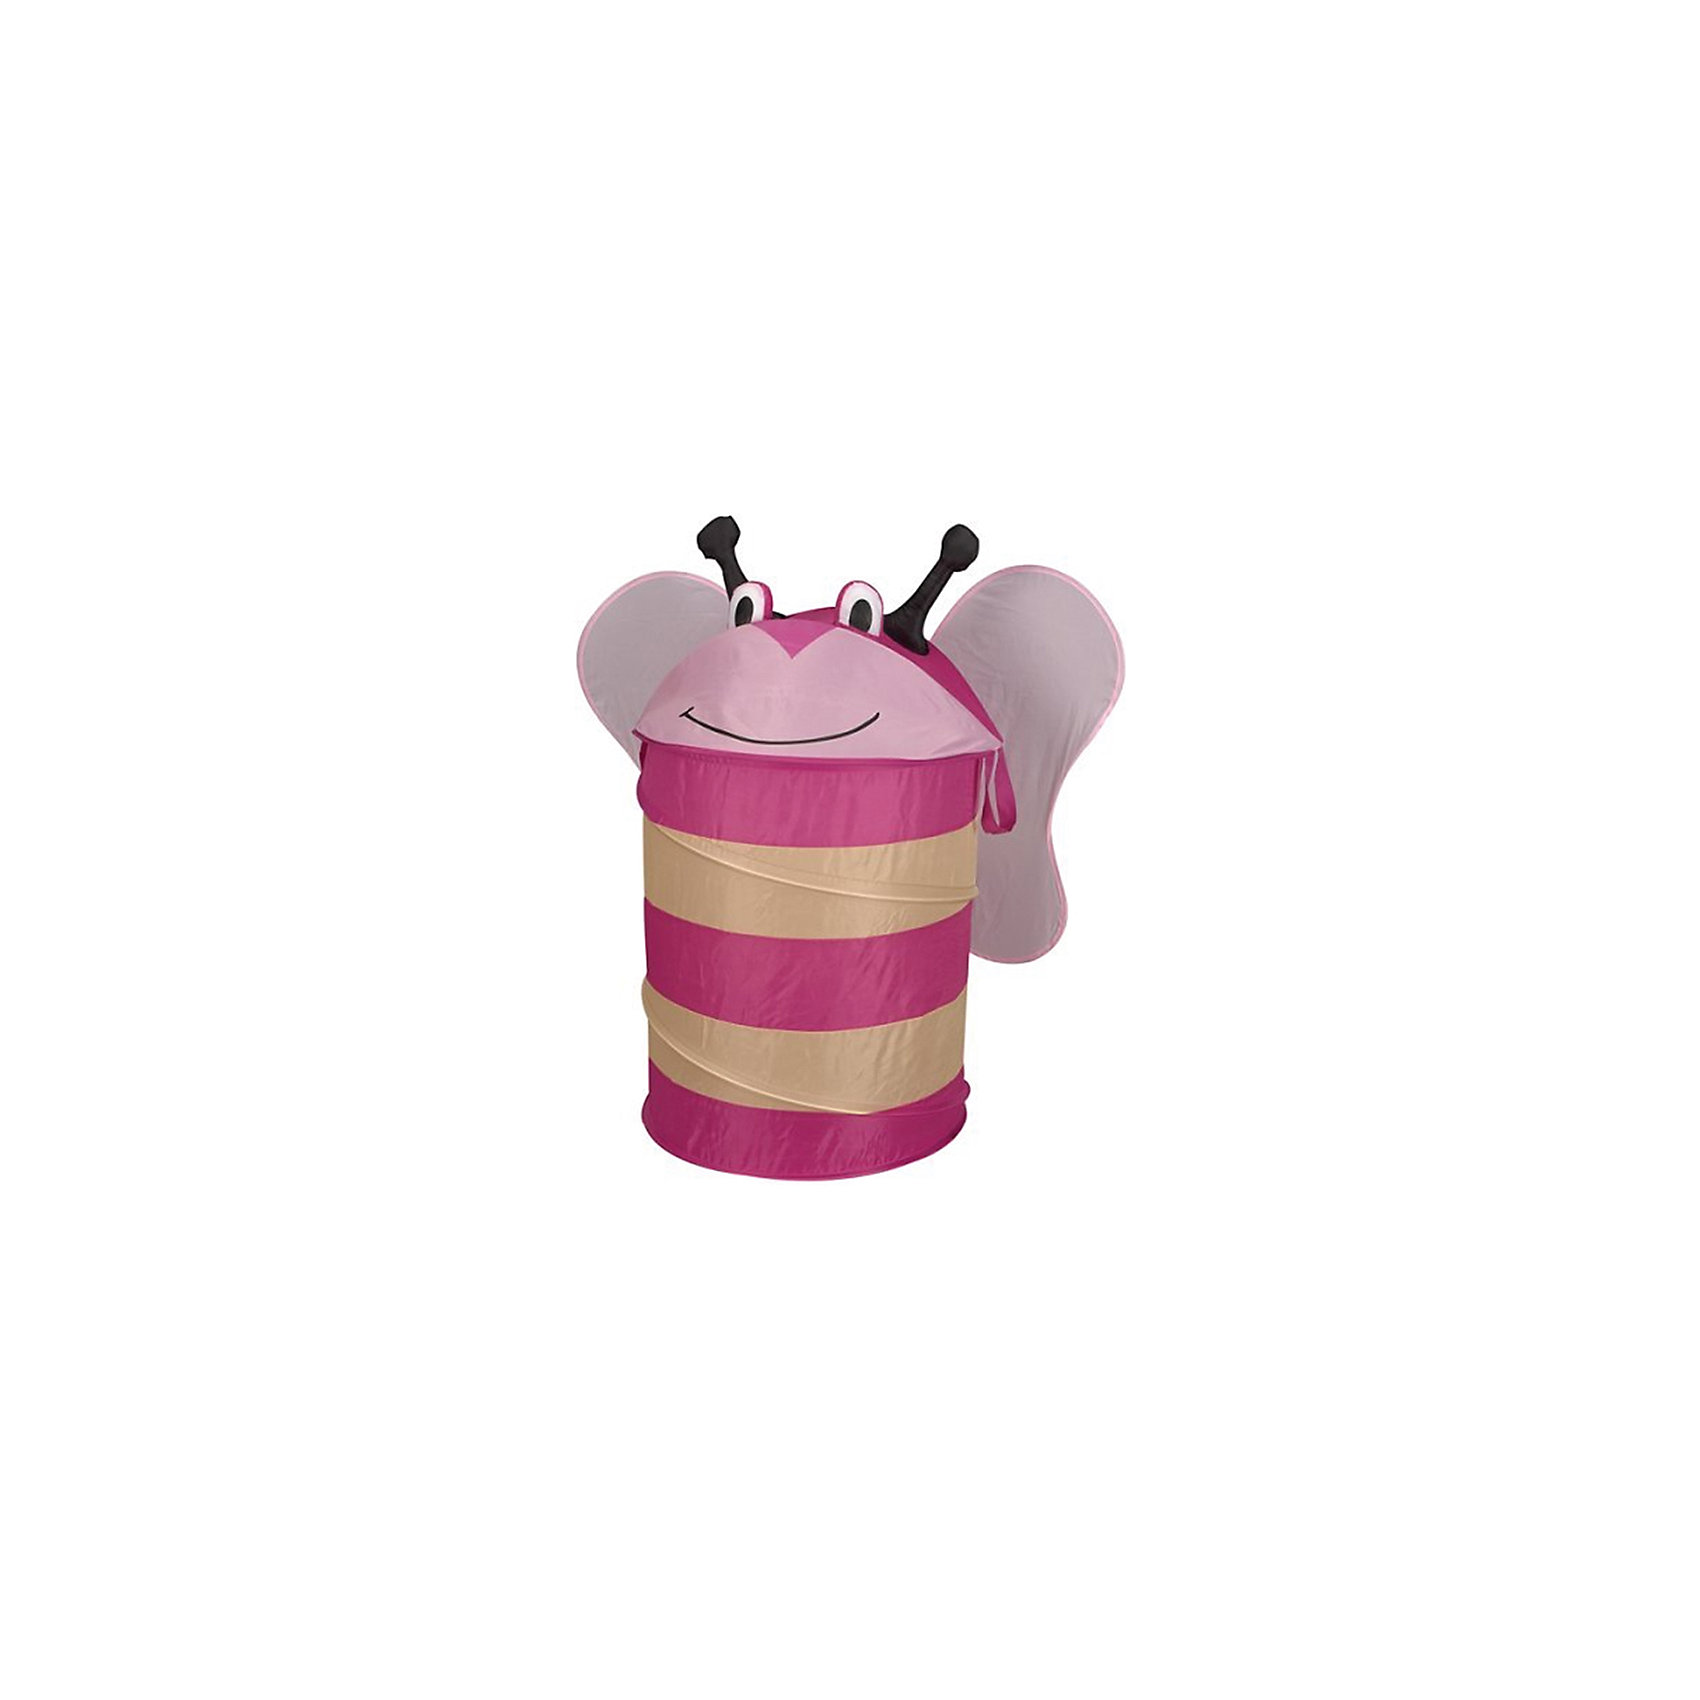 - Корзина для игрушек Пчелка [супермаркет] иномат импорт jingdong офиса хранение корзины кухня хранение корзина отделка корзина корзина хранения pink